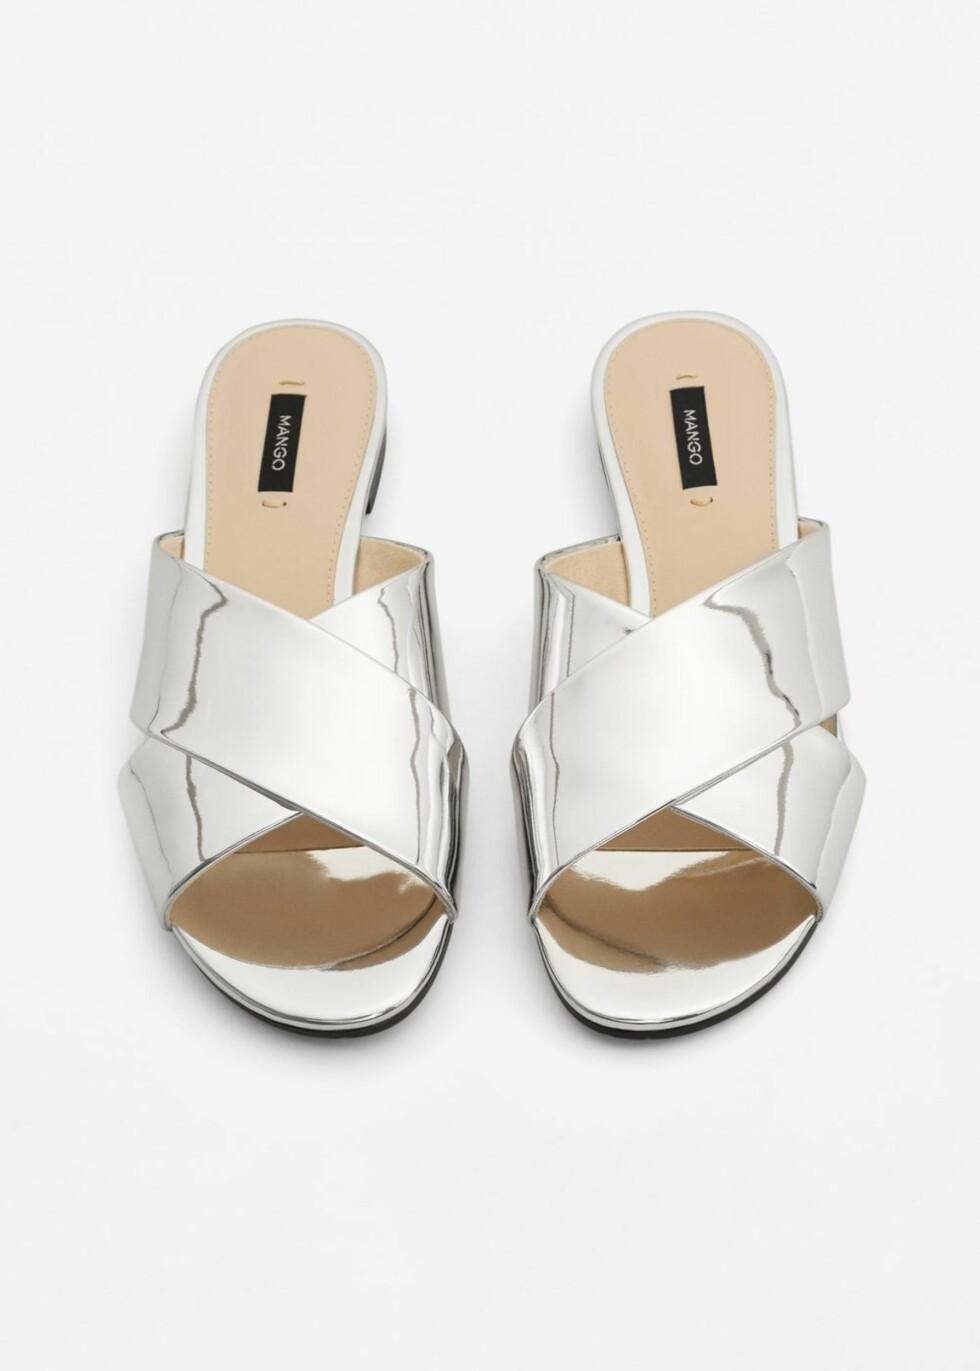 Sandaler fra Mango | kr 269 | http://shop.mango.com/NO/p1/damer/tilbeh%C3%B8r/sko/flate-sandaler/sandal-med-metallfargede-remmer?id=83025575_PL&n=1&s=accesorios.zapatos&ts=1496053539526